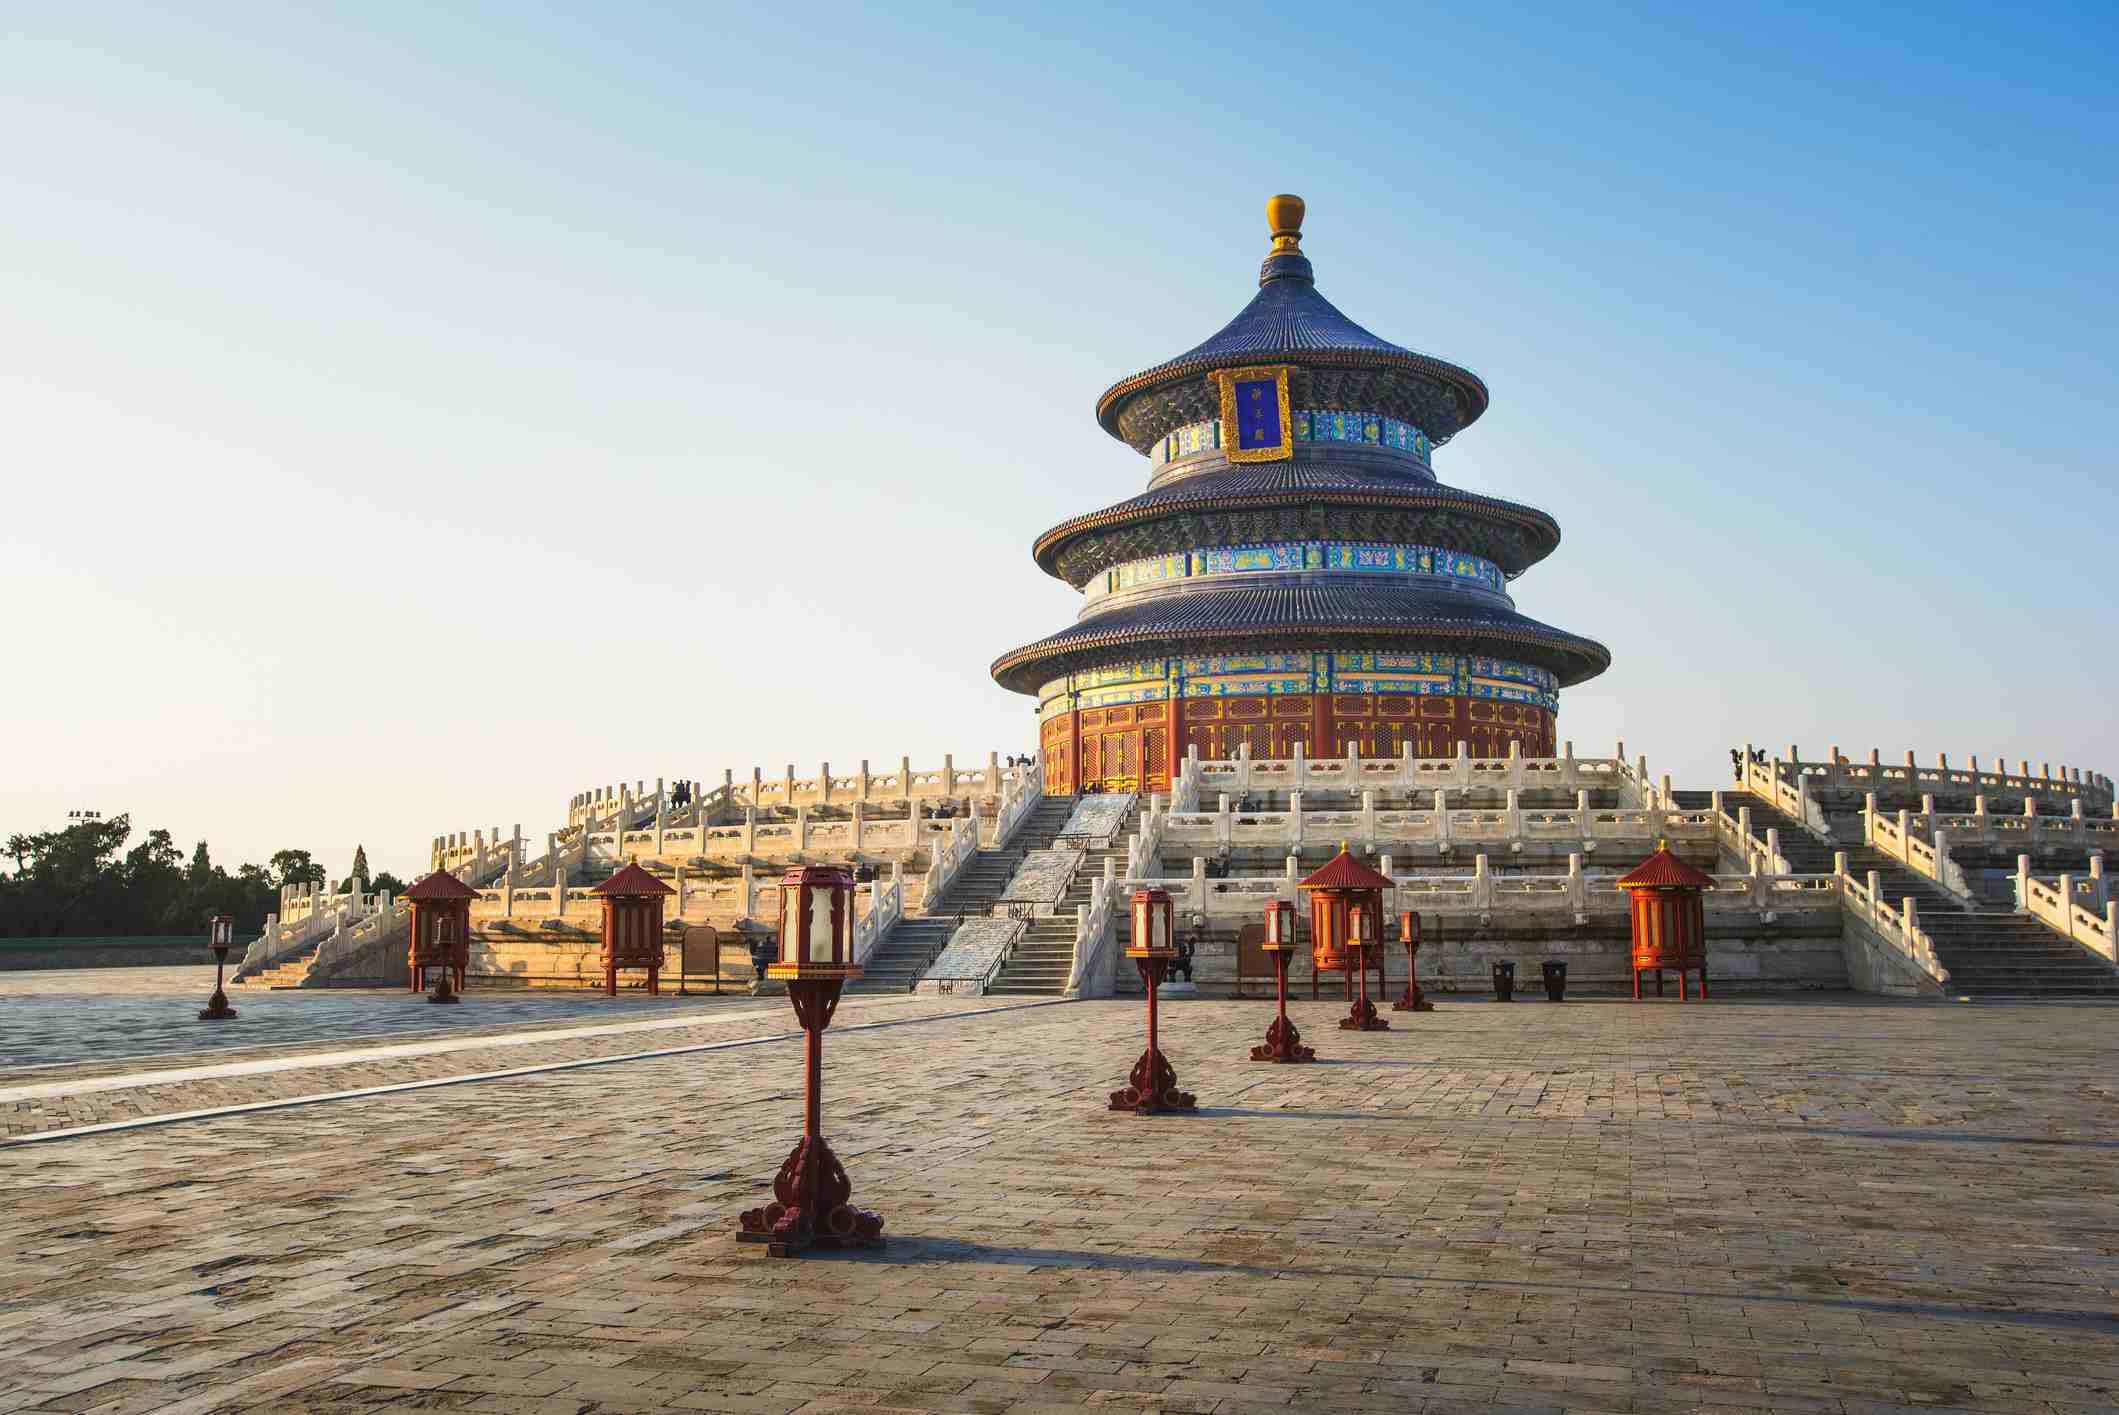 Temple of heaven,Beijing,China